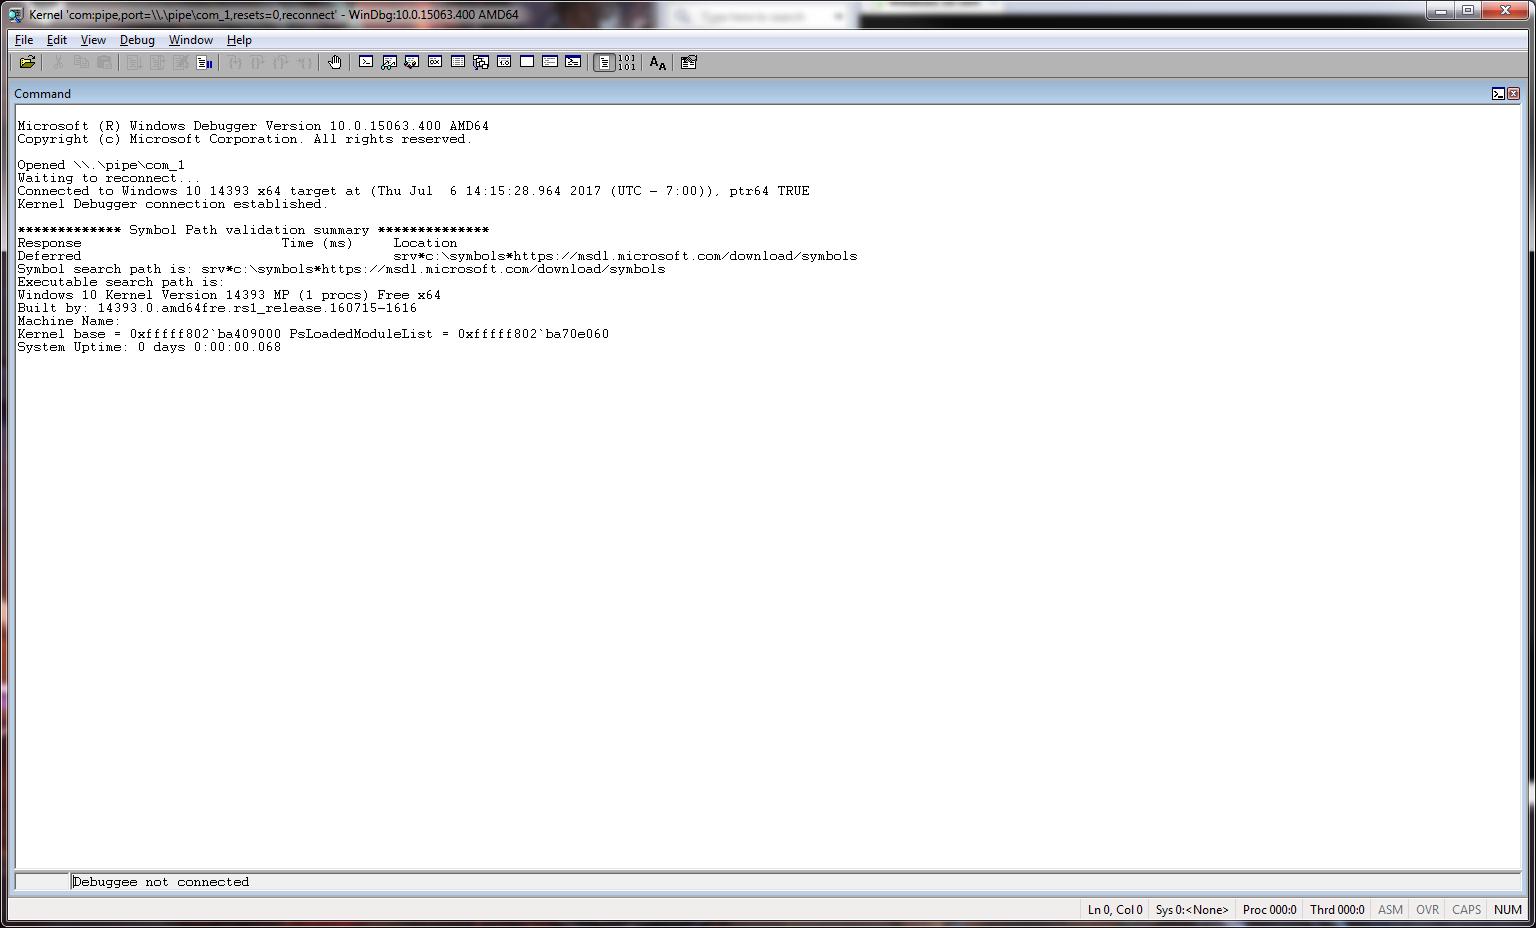 Setting up kernel debugging using WinDbg and VMware